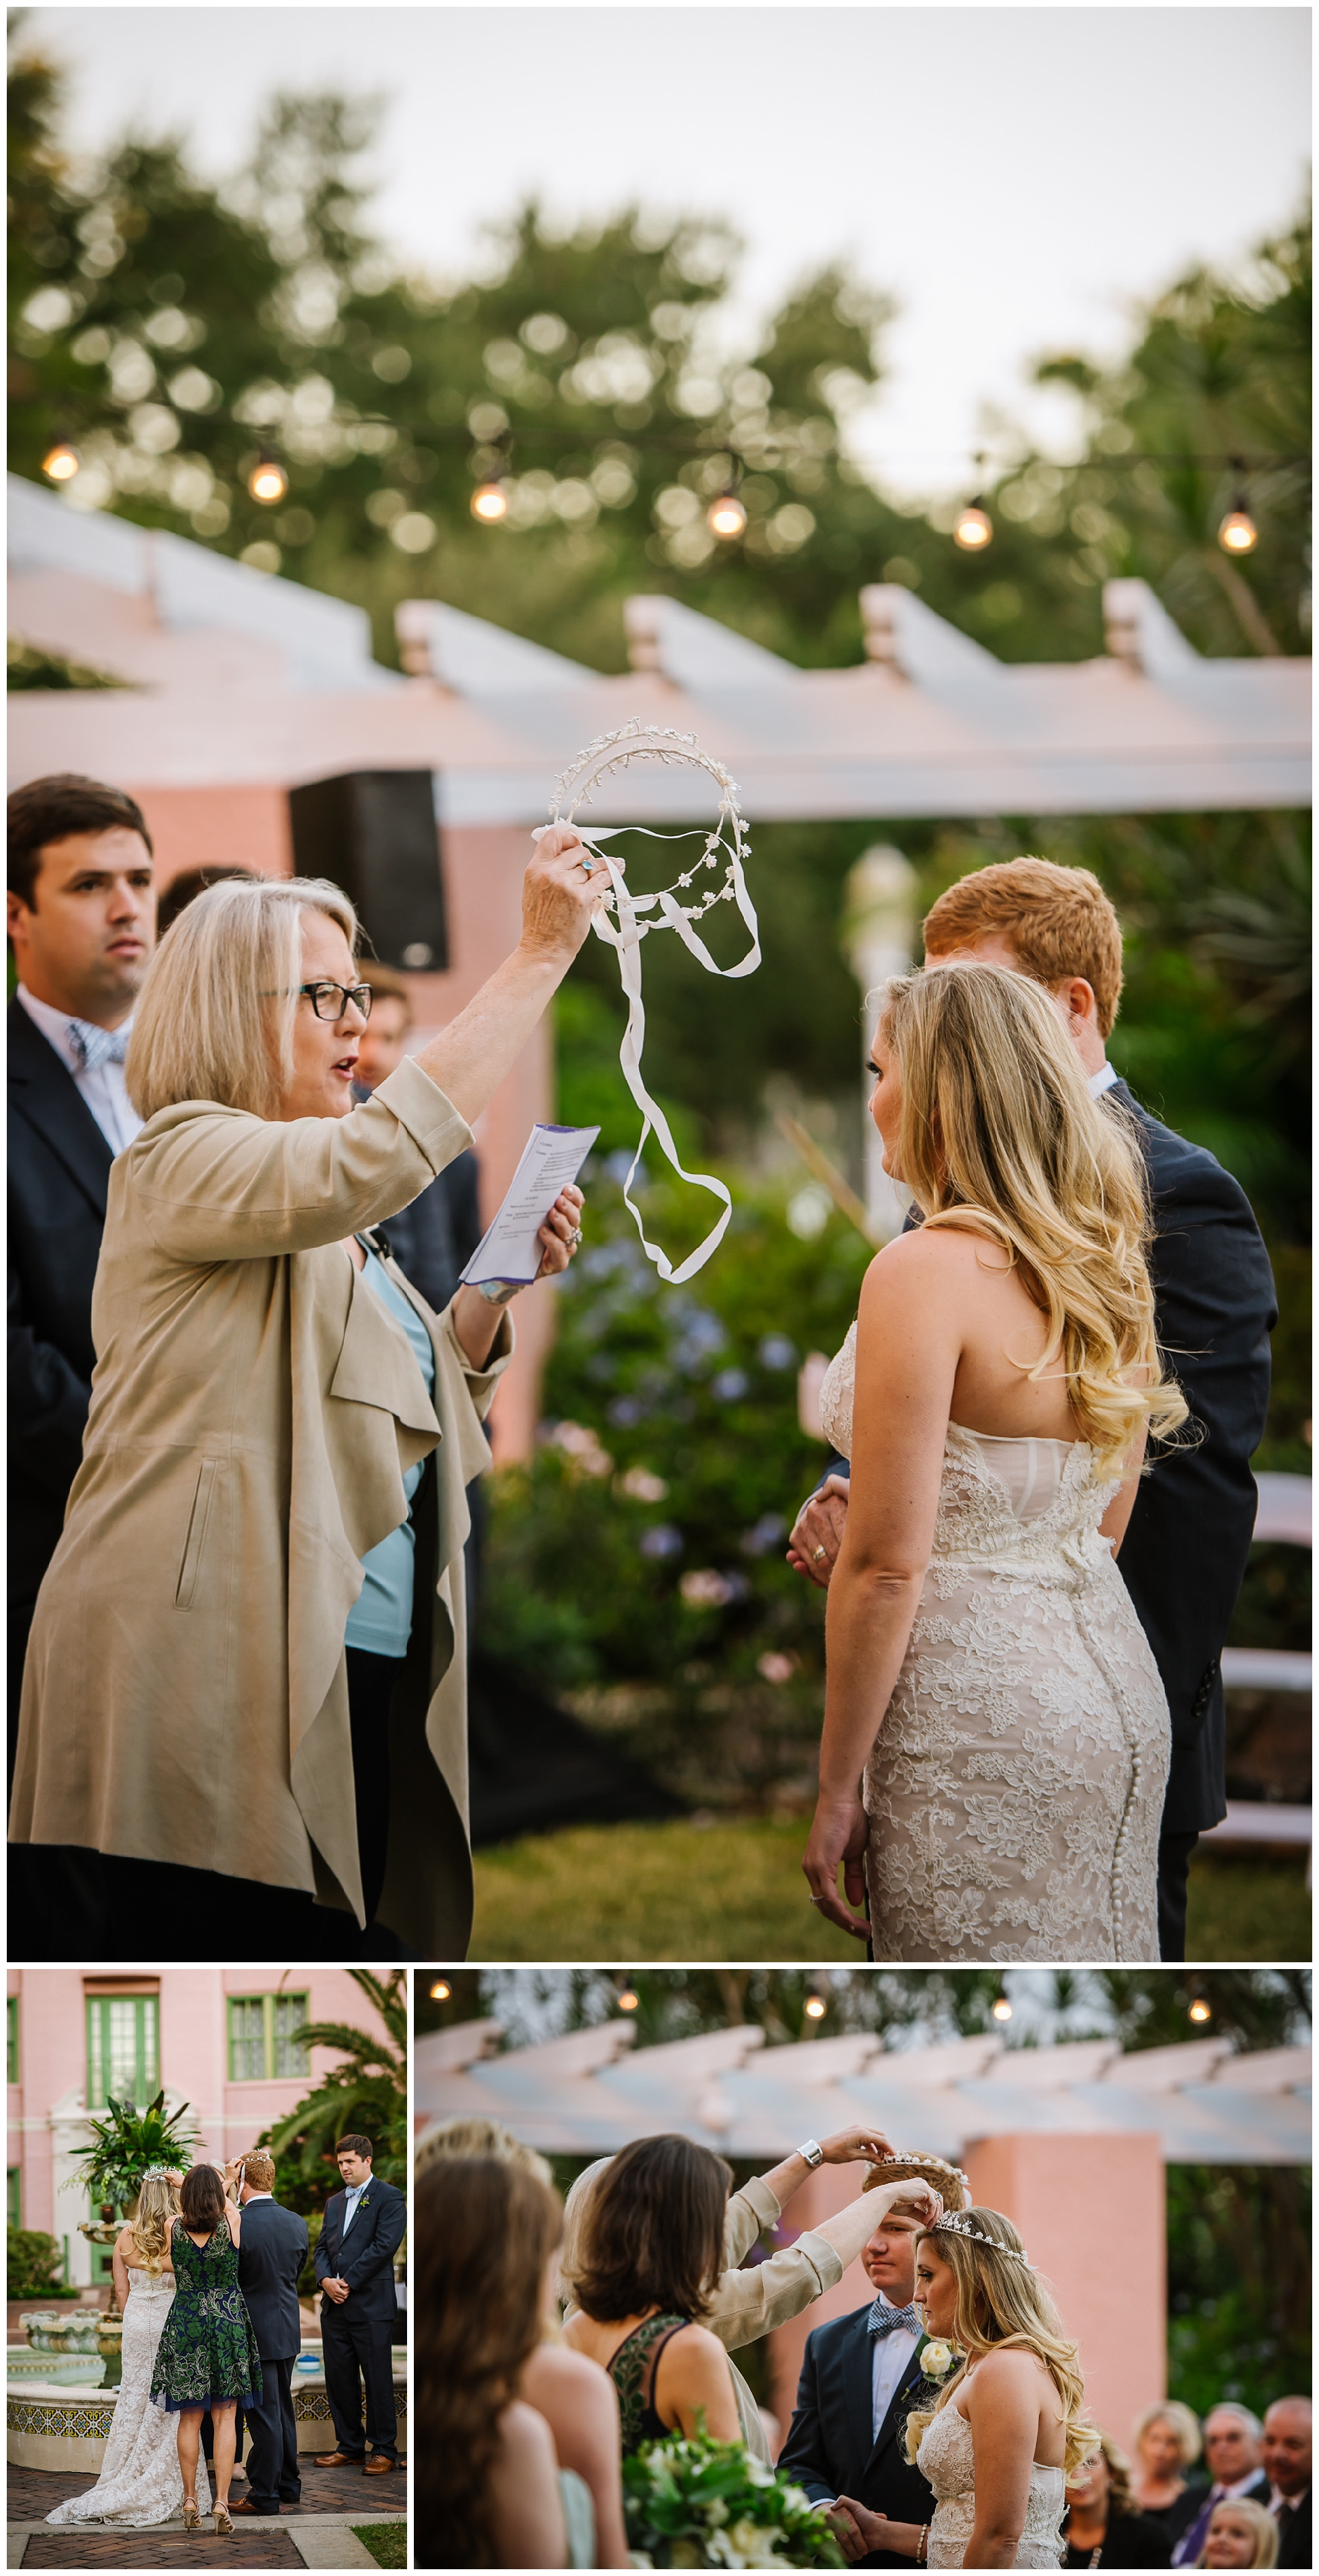 St-pete-wedding-photographer-grand-ballroom-vinoy-tea-garden-greek-luxury_0159.jpg